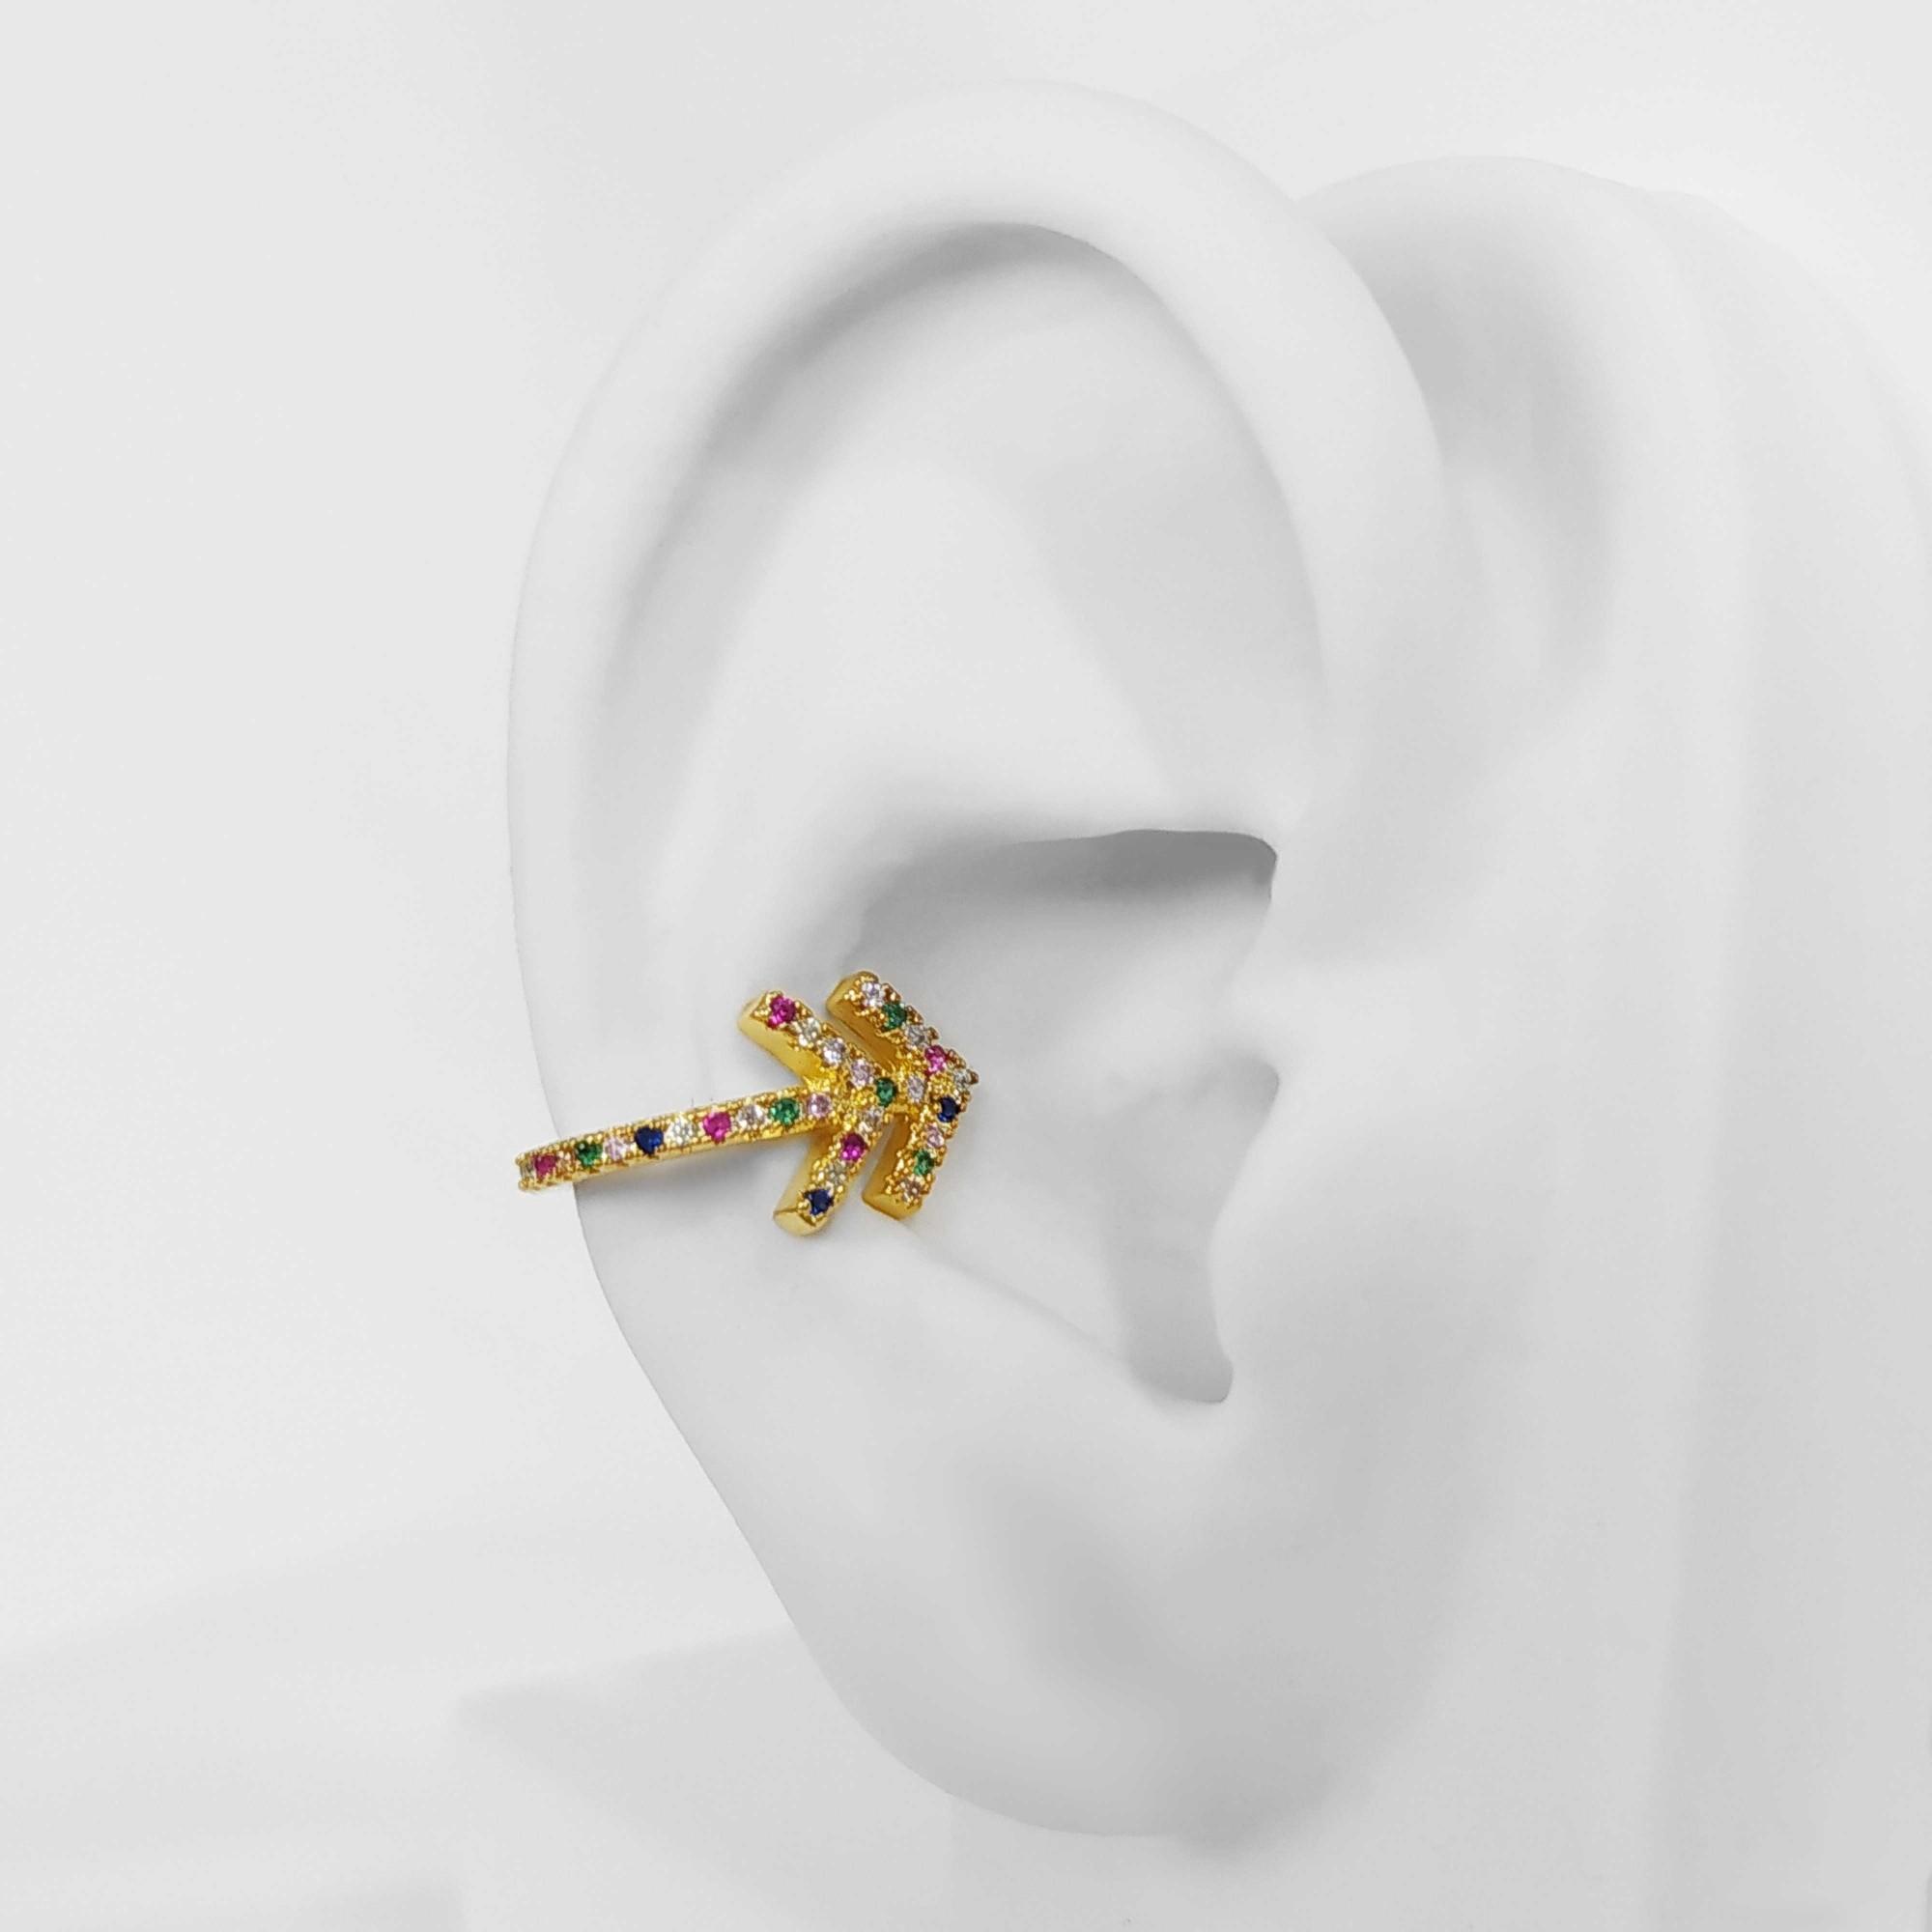 Brinco Piercing Fake Flecha Zircônias Folheado Ouro 18k  - Lunozê Joias